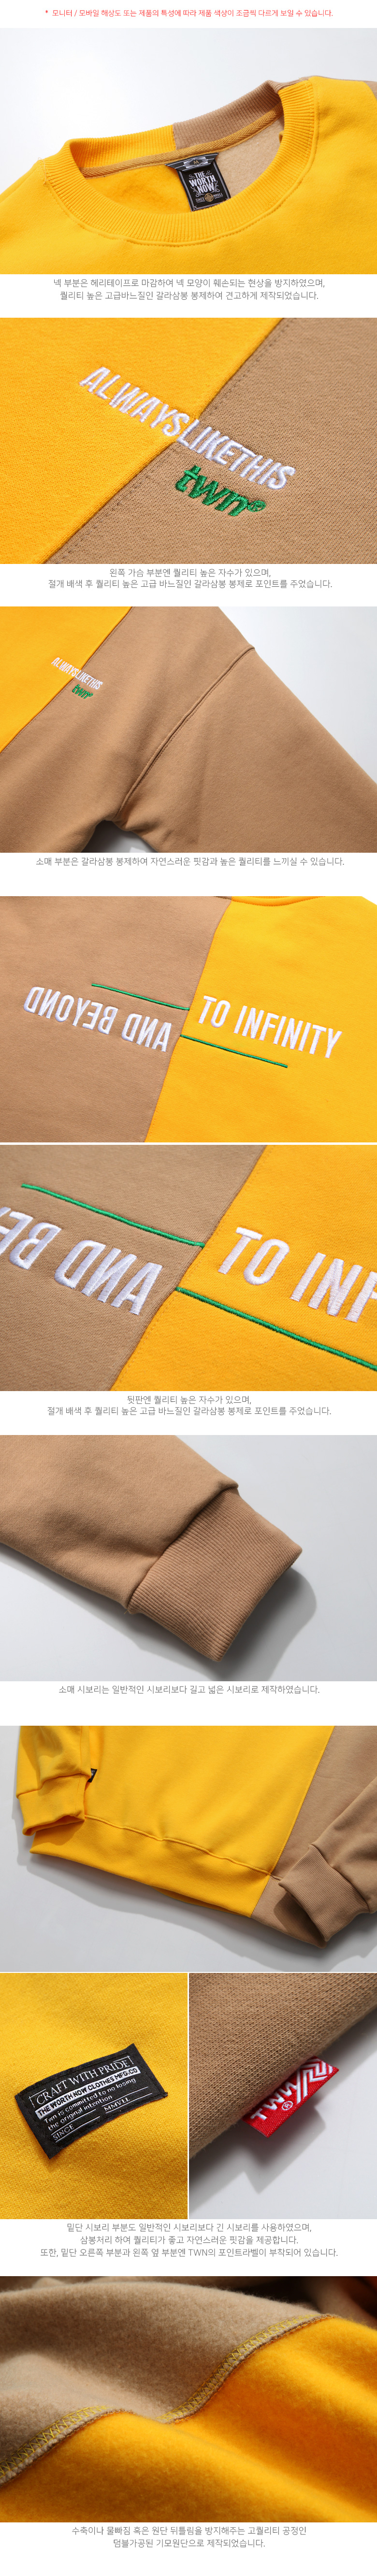 20190214_twn_quarter_detail_mustard_ym_02.jpg